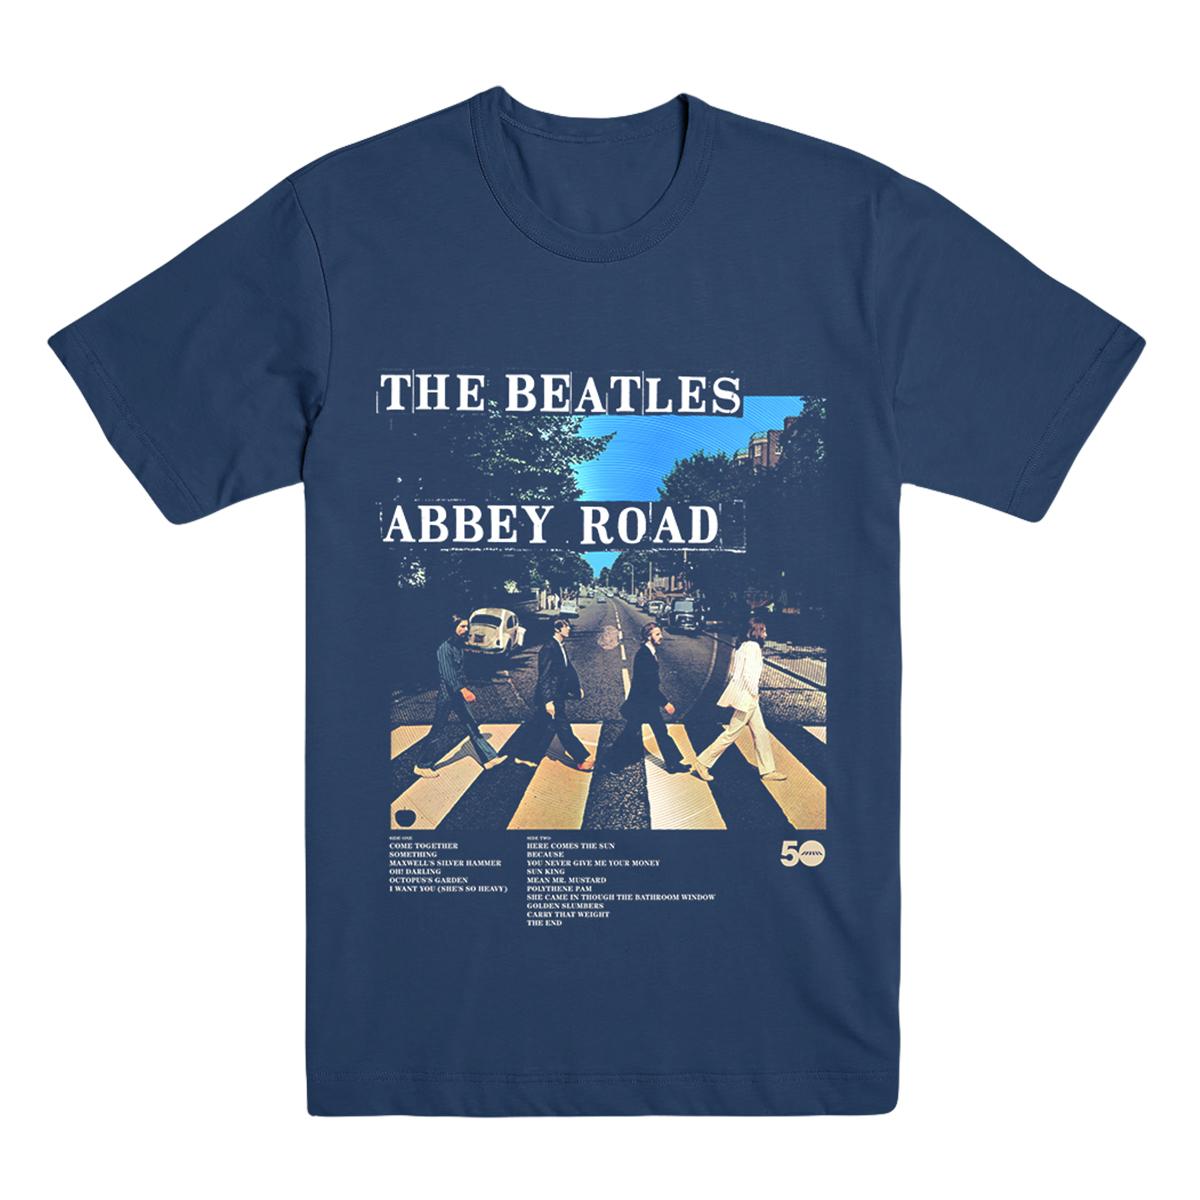 Abbey Road 50th Anniversary Tee